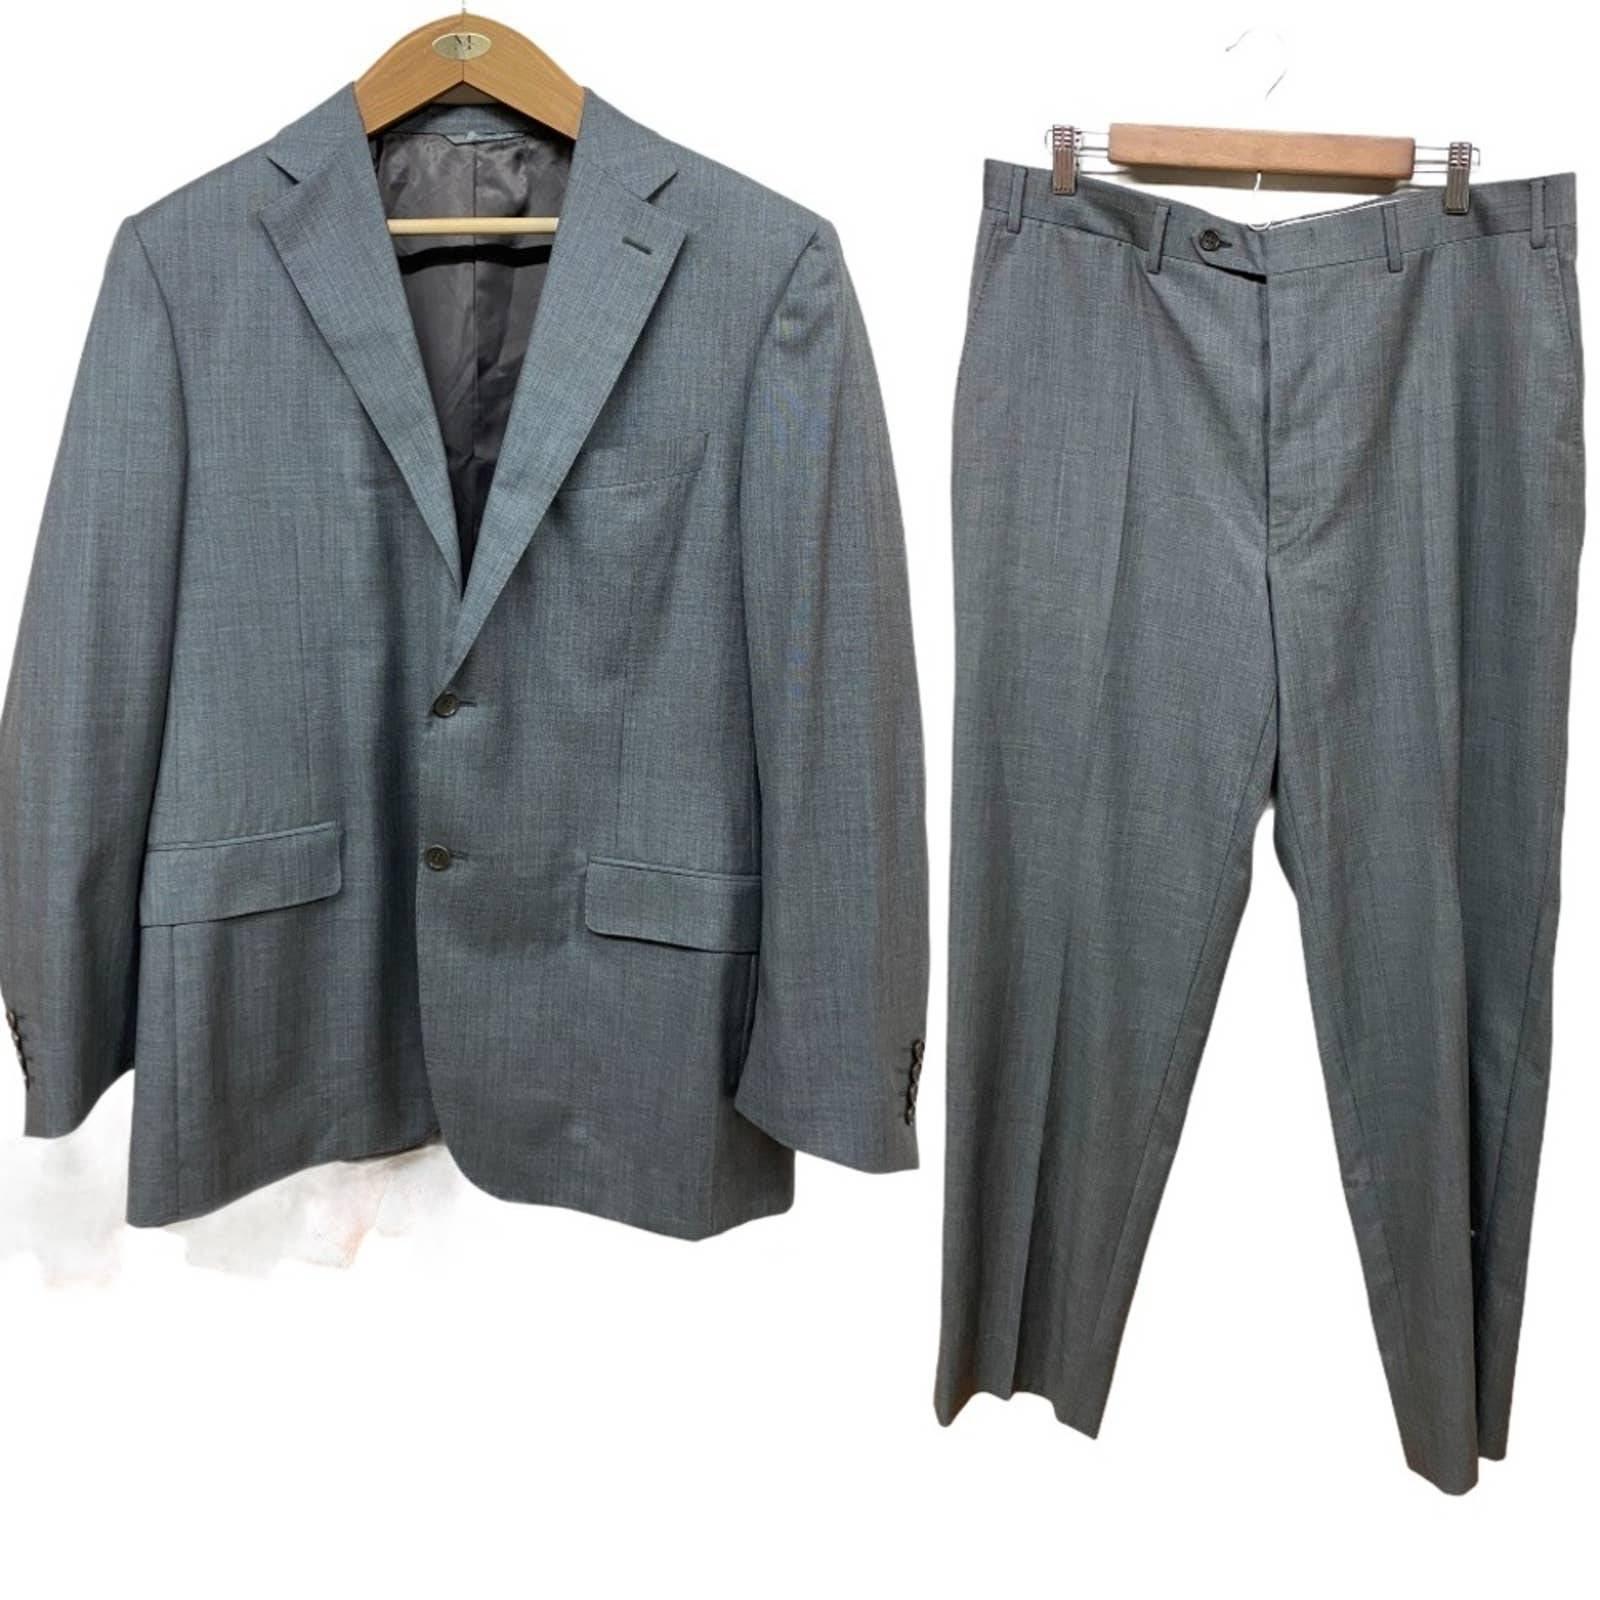 Canali Gray Wool Suit Jacket Pants Set